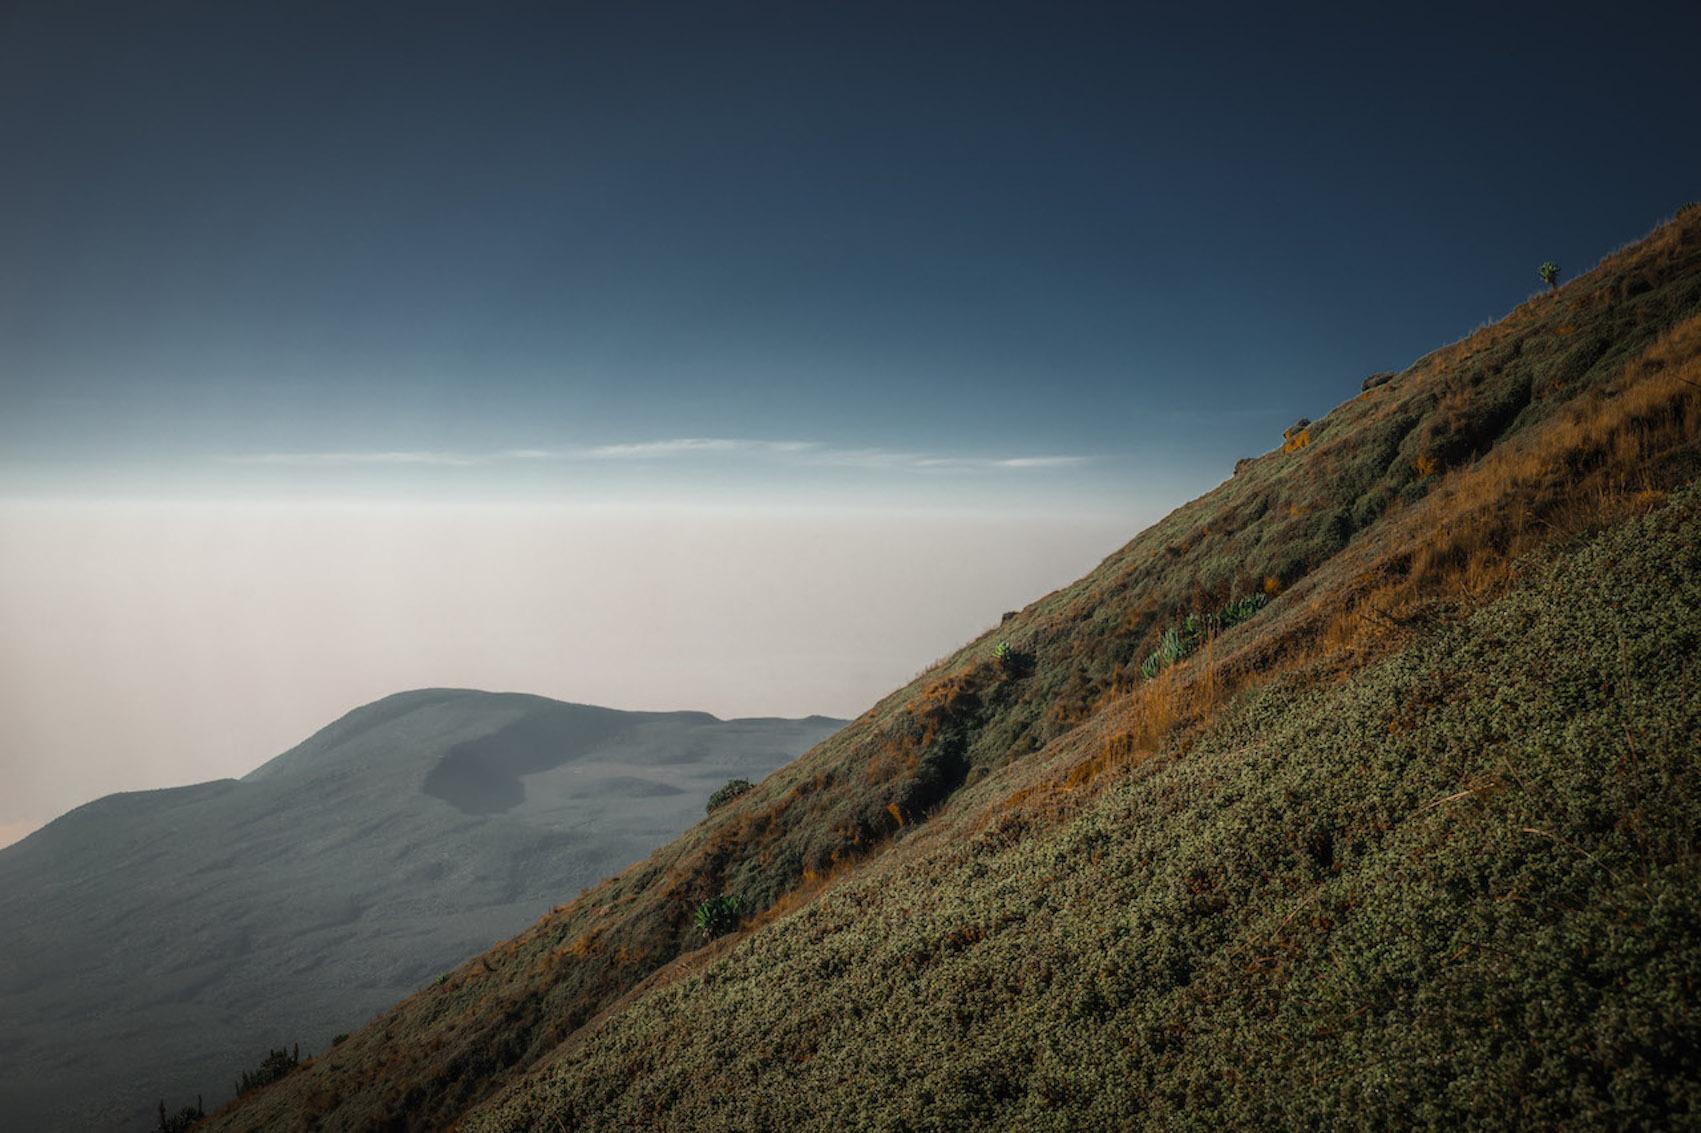 Sur les pentes du volcan Karisimbi au Rwanda.